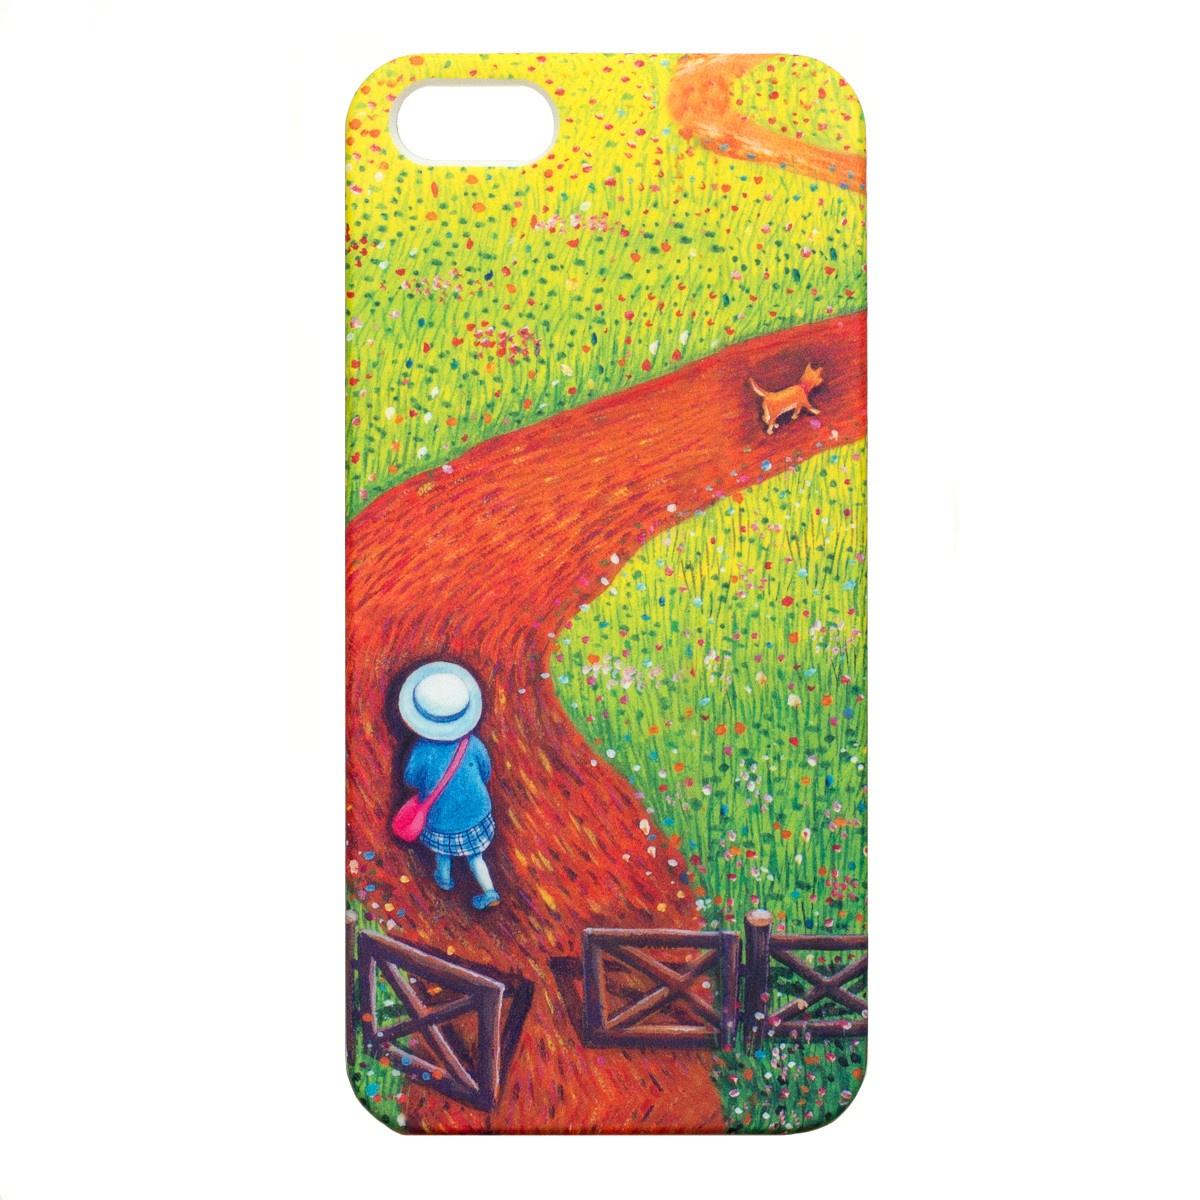 Чехол для сотового телефона Mitya Veselkov KAFKA, KAFKAFIVE-25 цена и фото